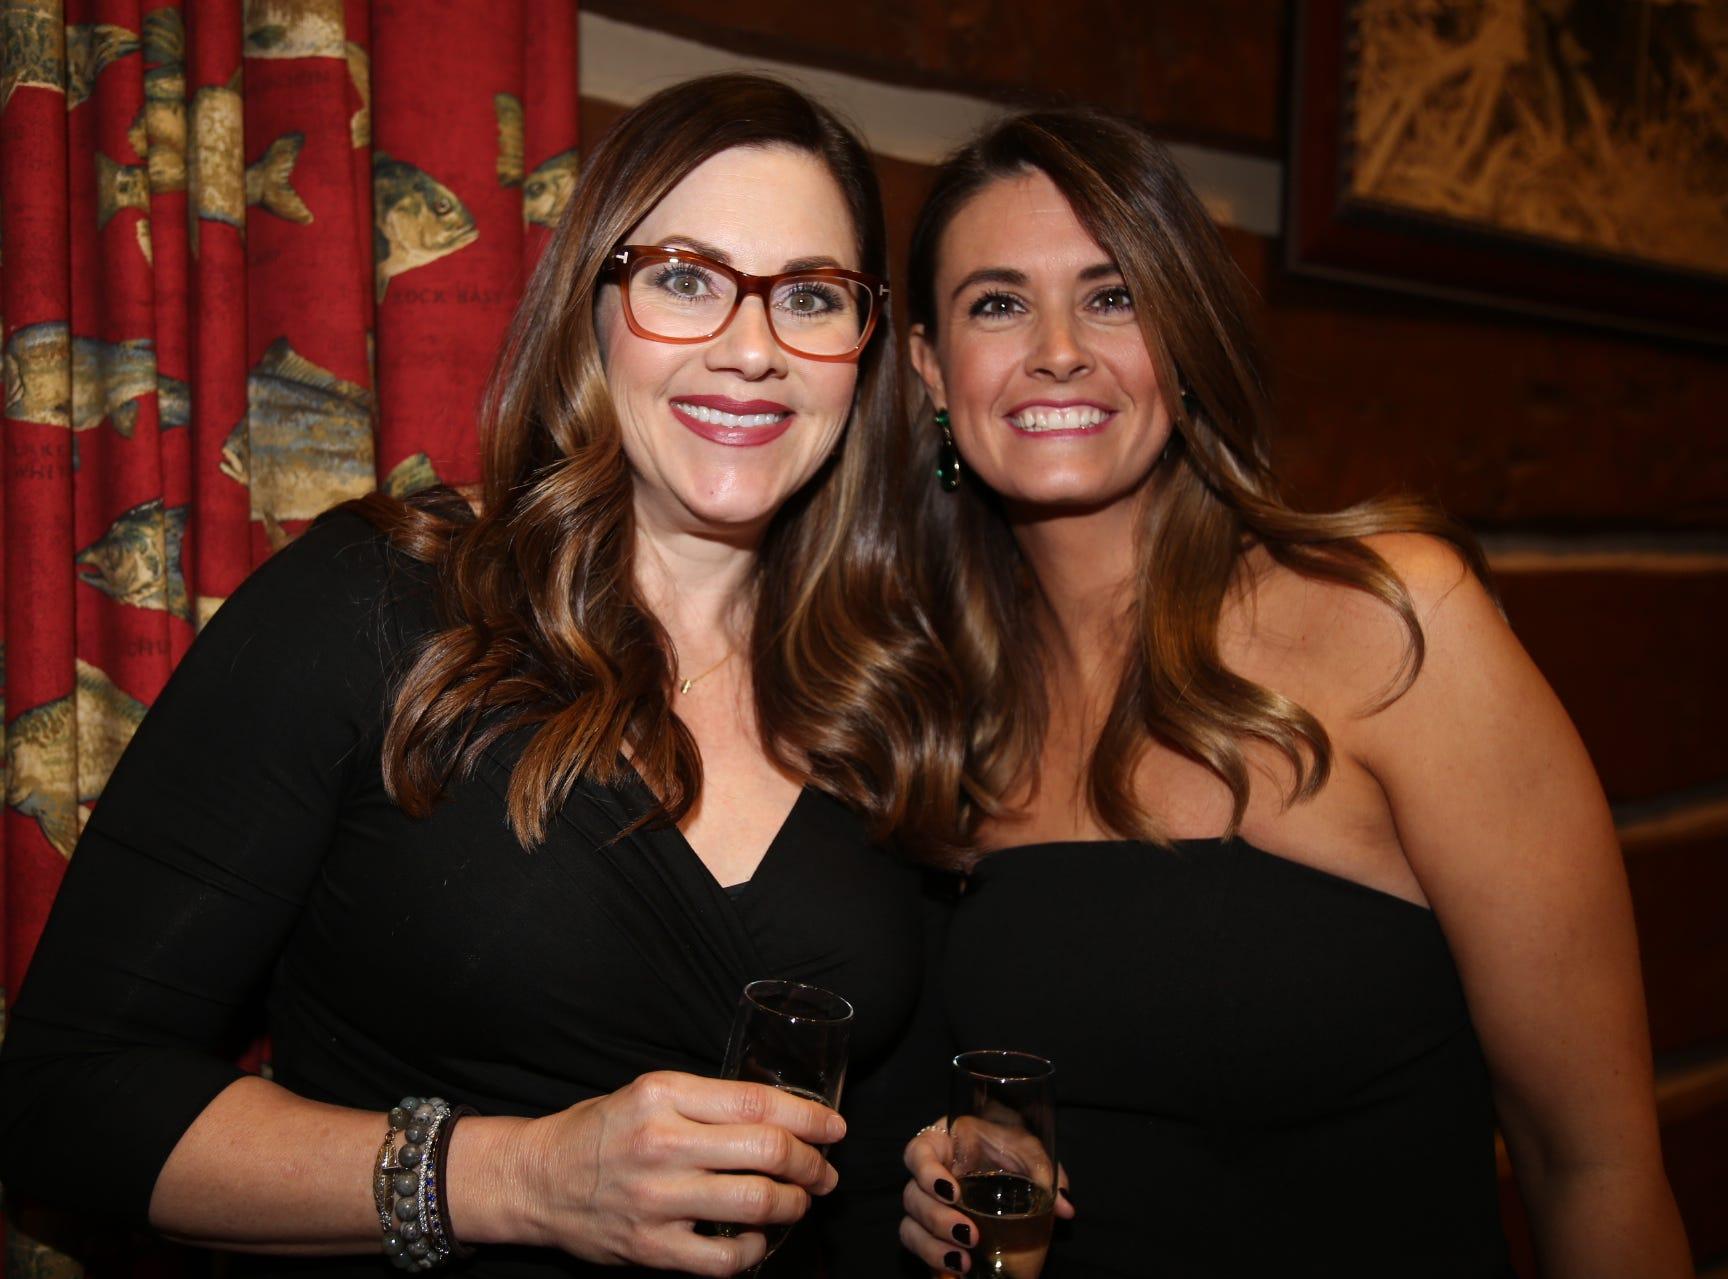 Jennifer Freeman and Emily Alloway